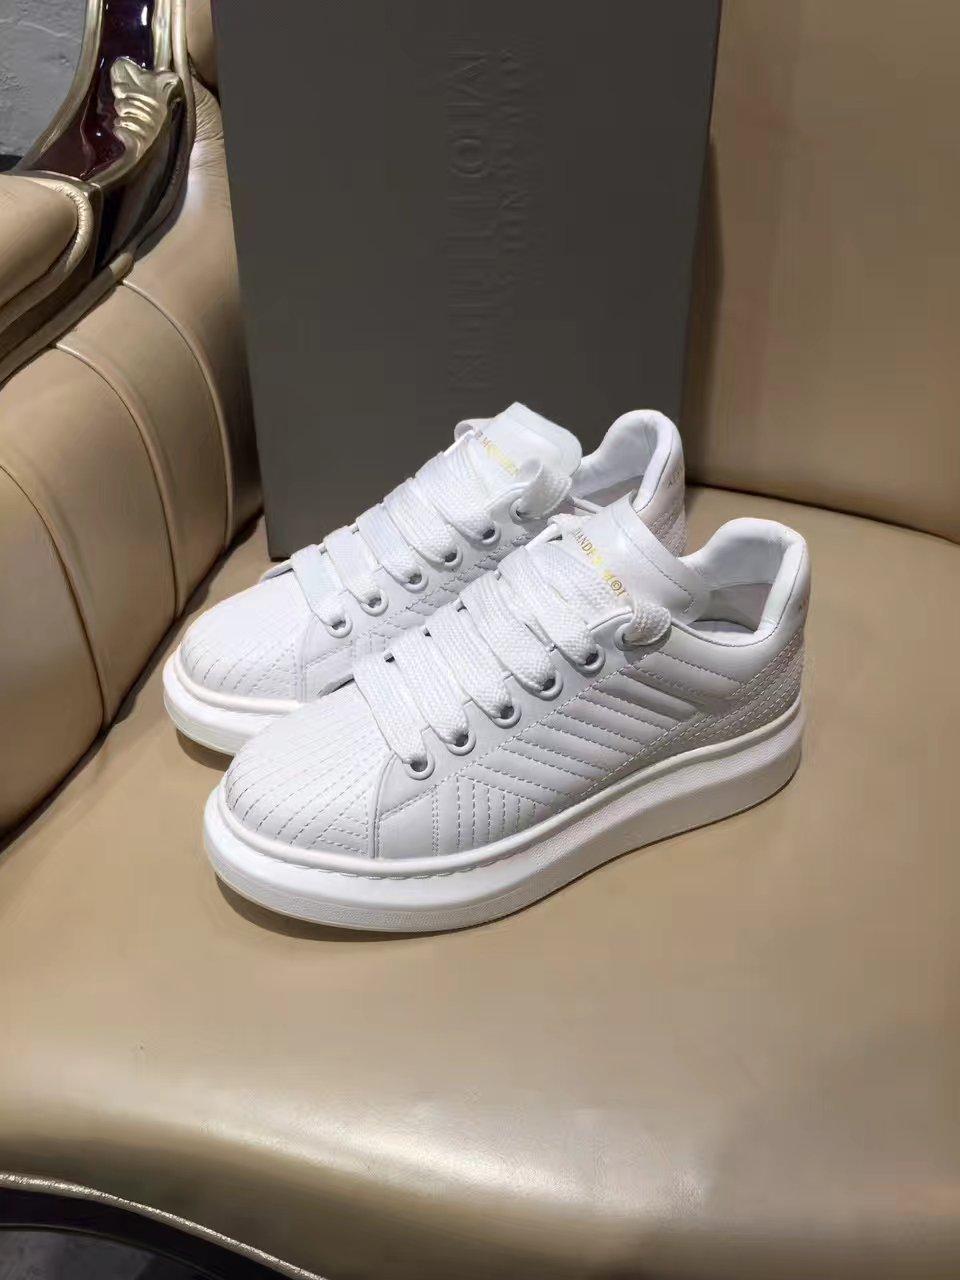 Alexander MQUEEN情侣款小白鞋